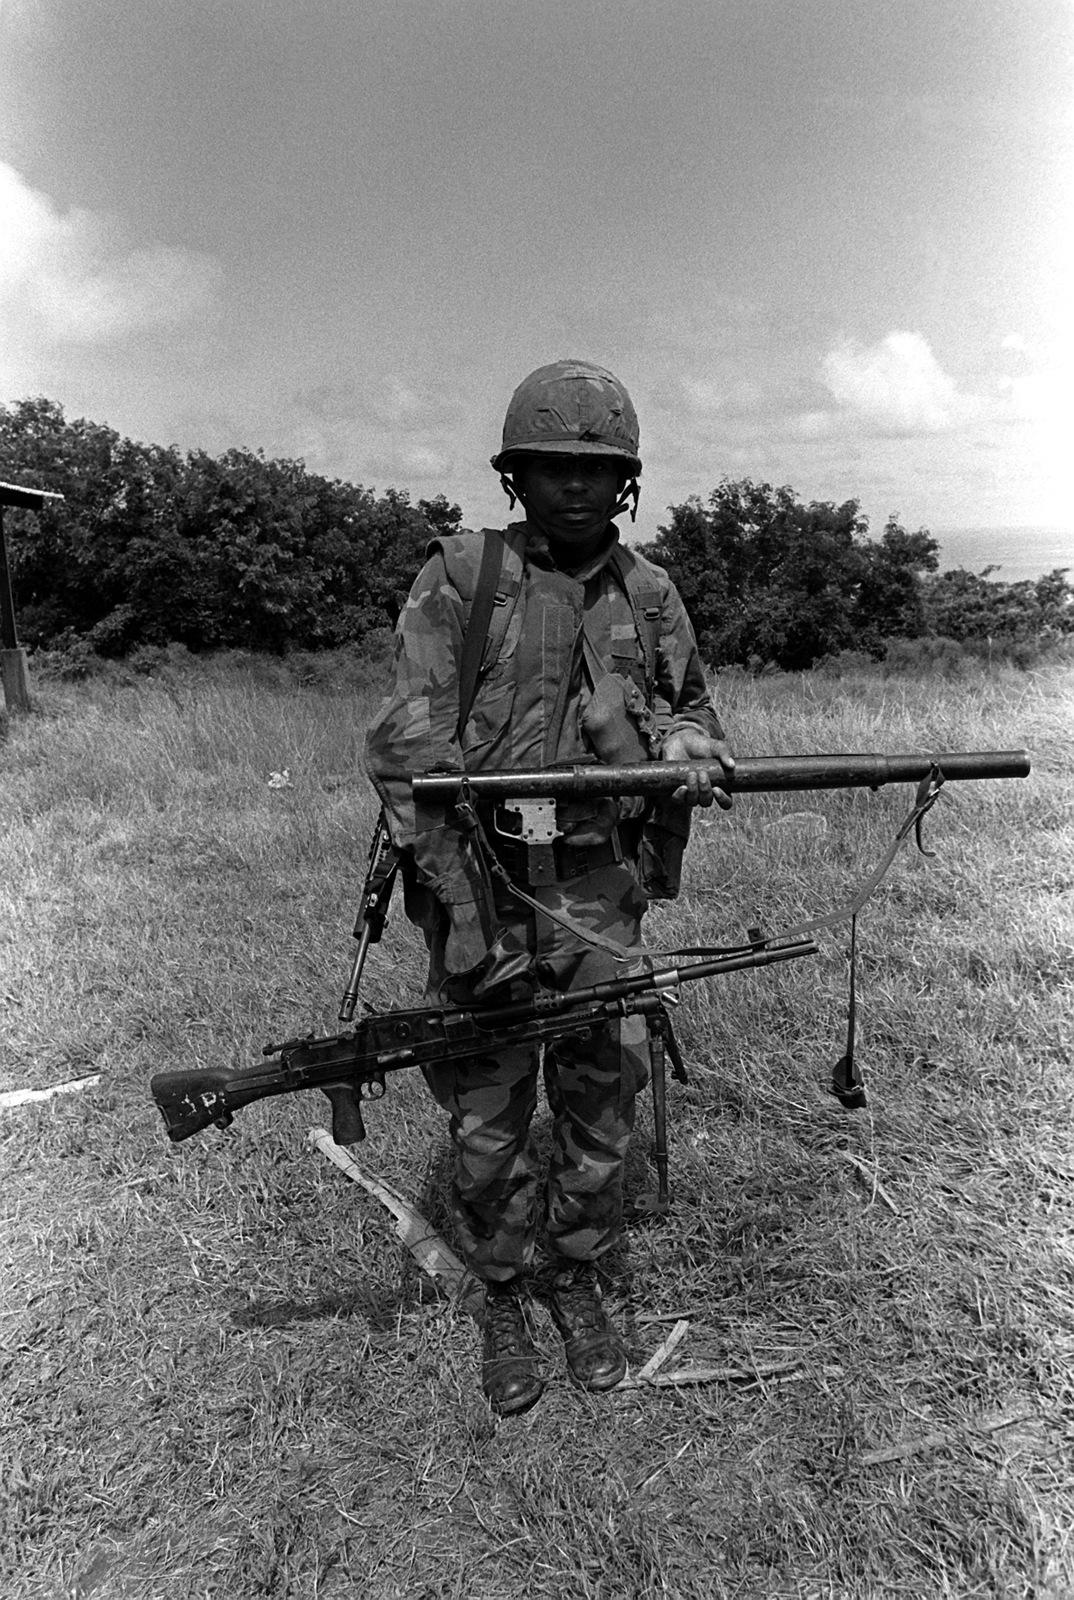 A Marine Displays Seized Soviet RPG 2 Rocket Launcher And Bren Light Machine Gun After Arriving With Battalion Landing Team During Operation Urgent